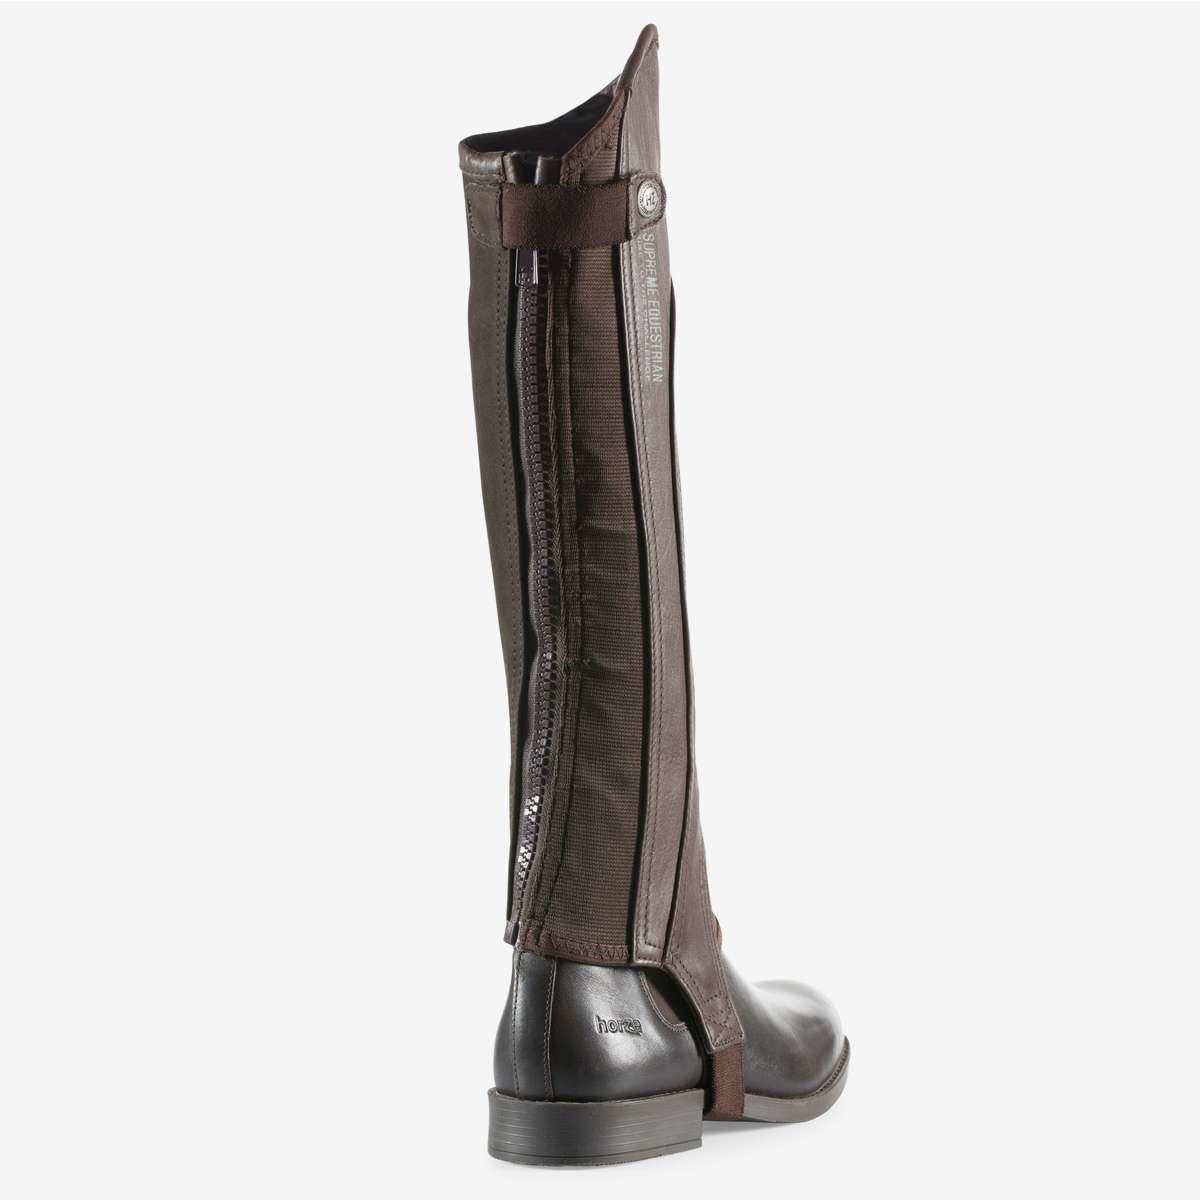 Horze Supreme Quinton Soft Leather Half Chaps Nubuck Leather for Grip